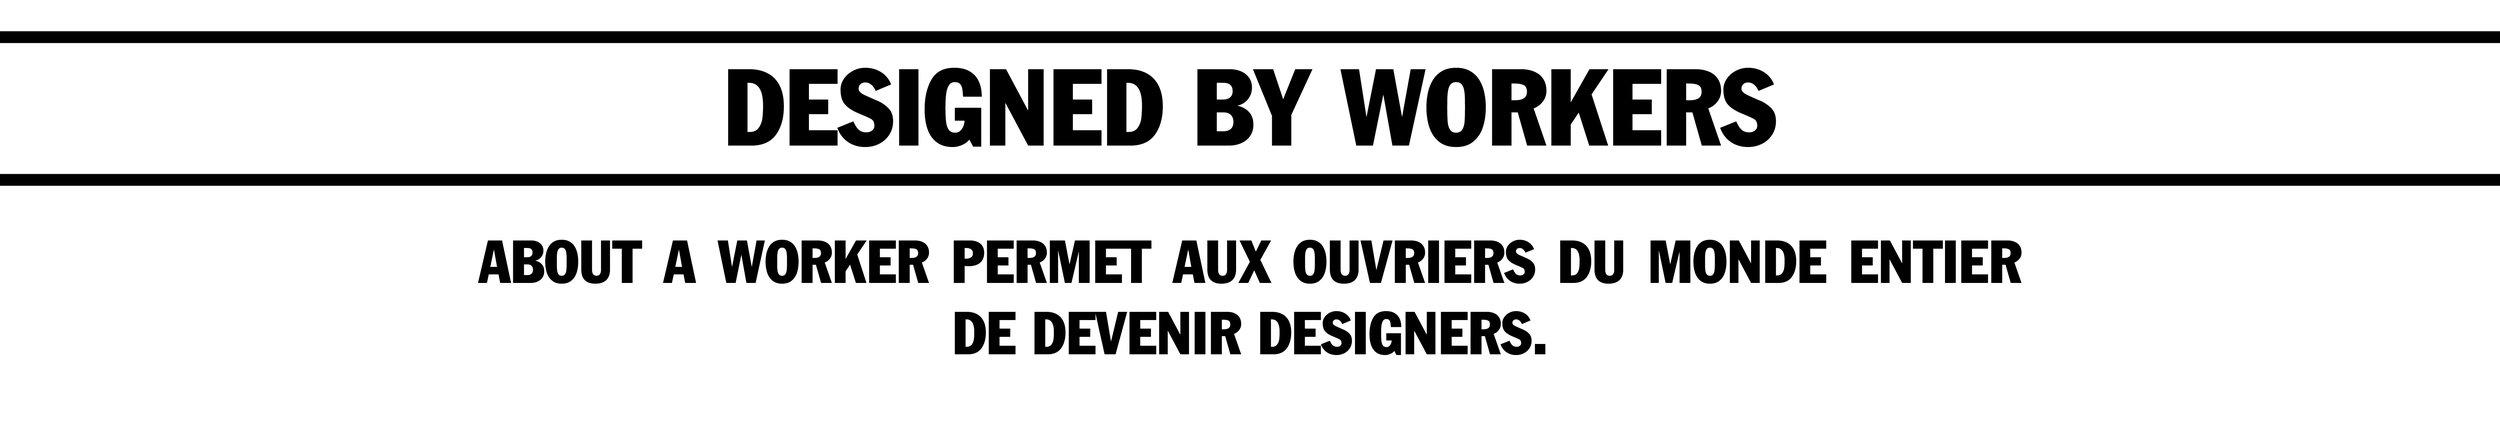 banner_designed_by_workers_newfr.jpg